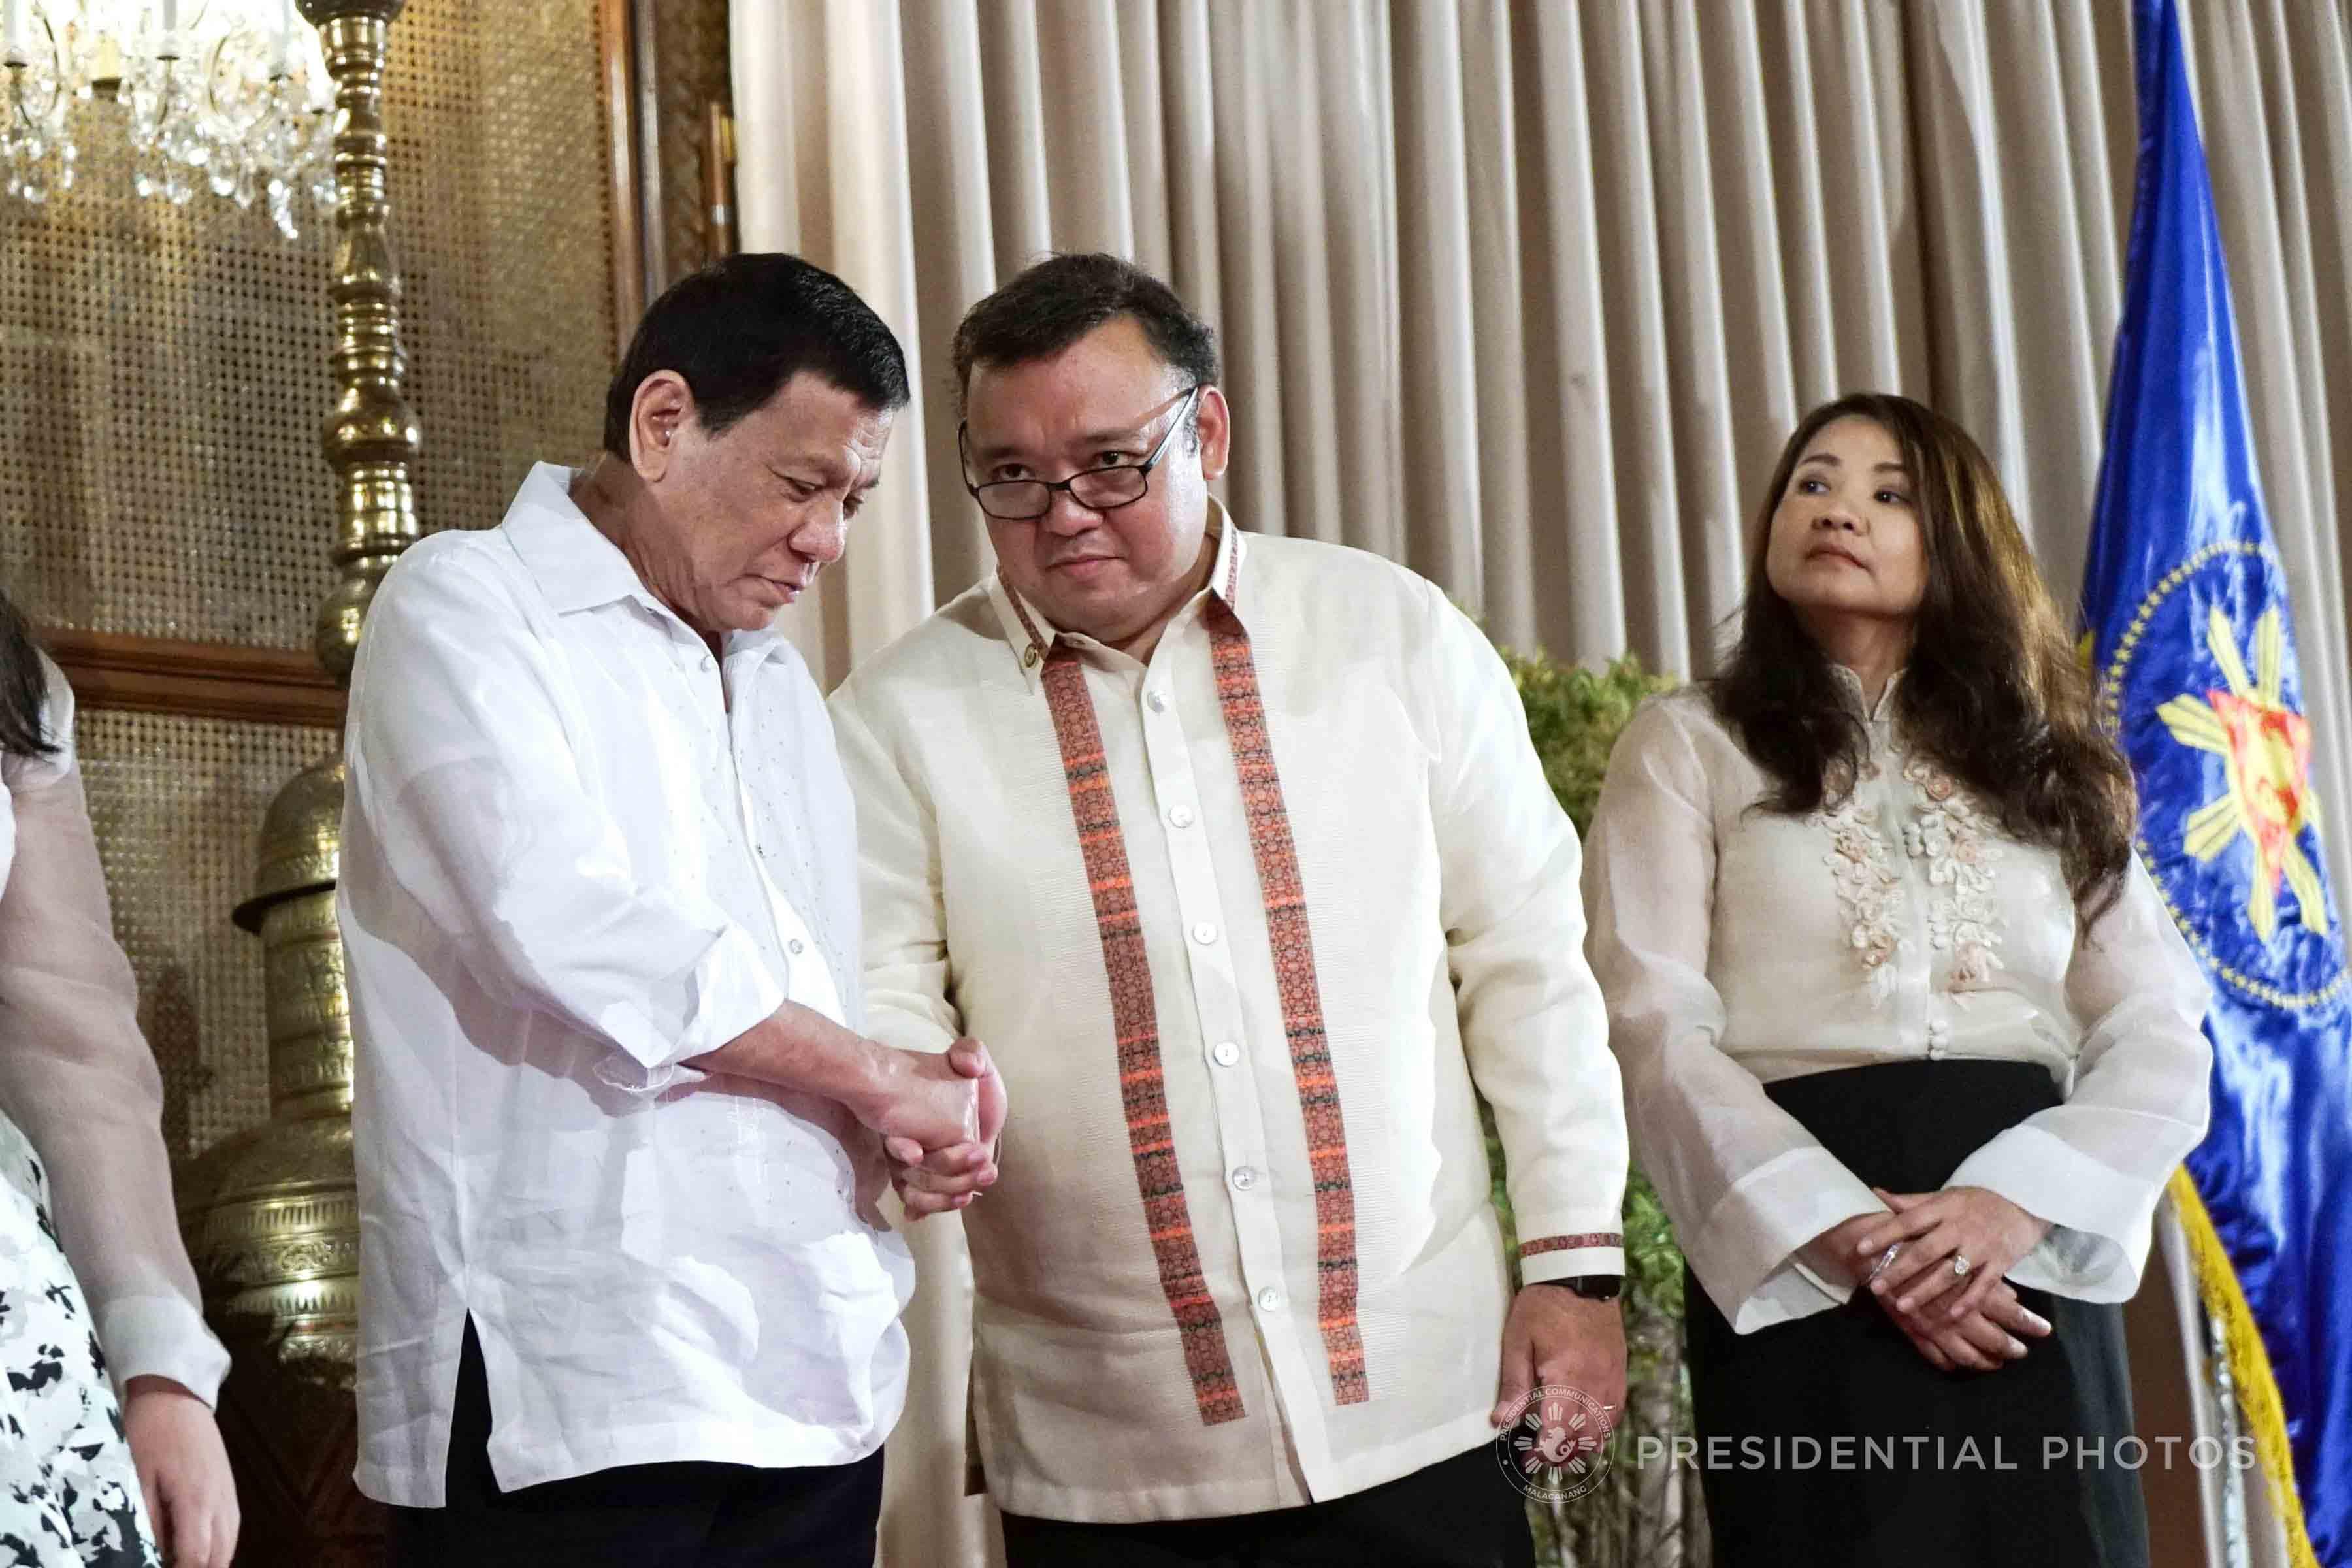 NEW JOB. President Rodrigo Duterte congratulates newly-appointed Presidential Spokesperson Harry Roque following his oath-taking ceremony. Malacau00f1ang photo